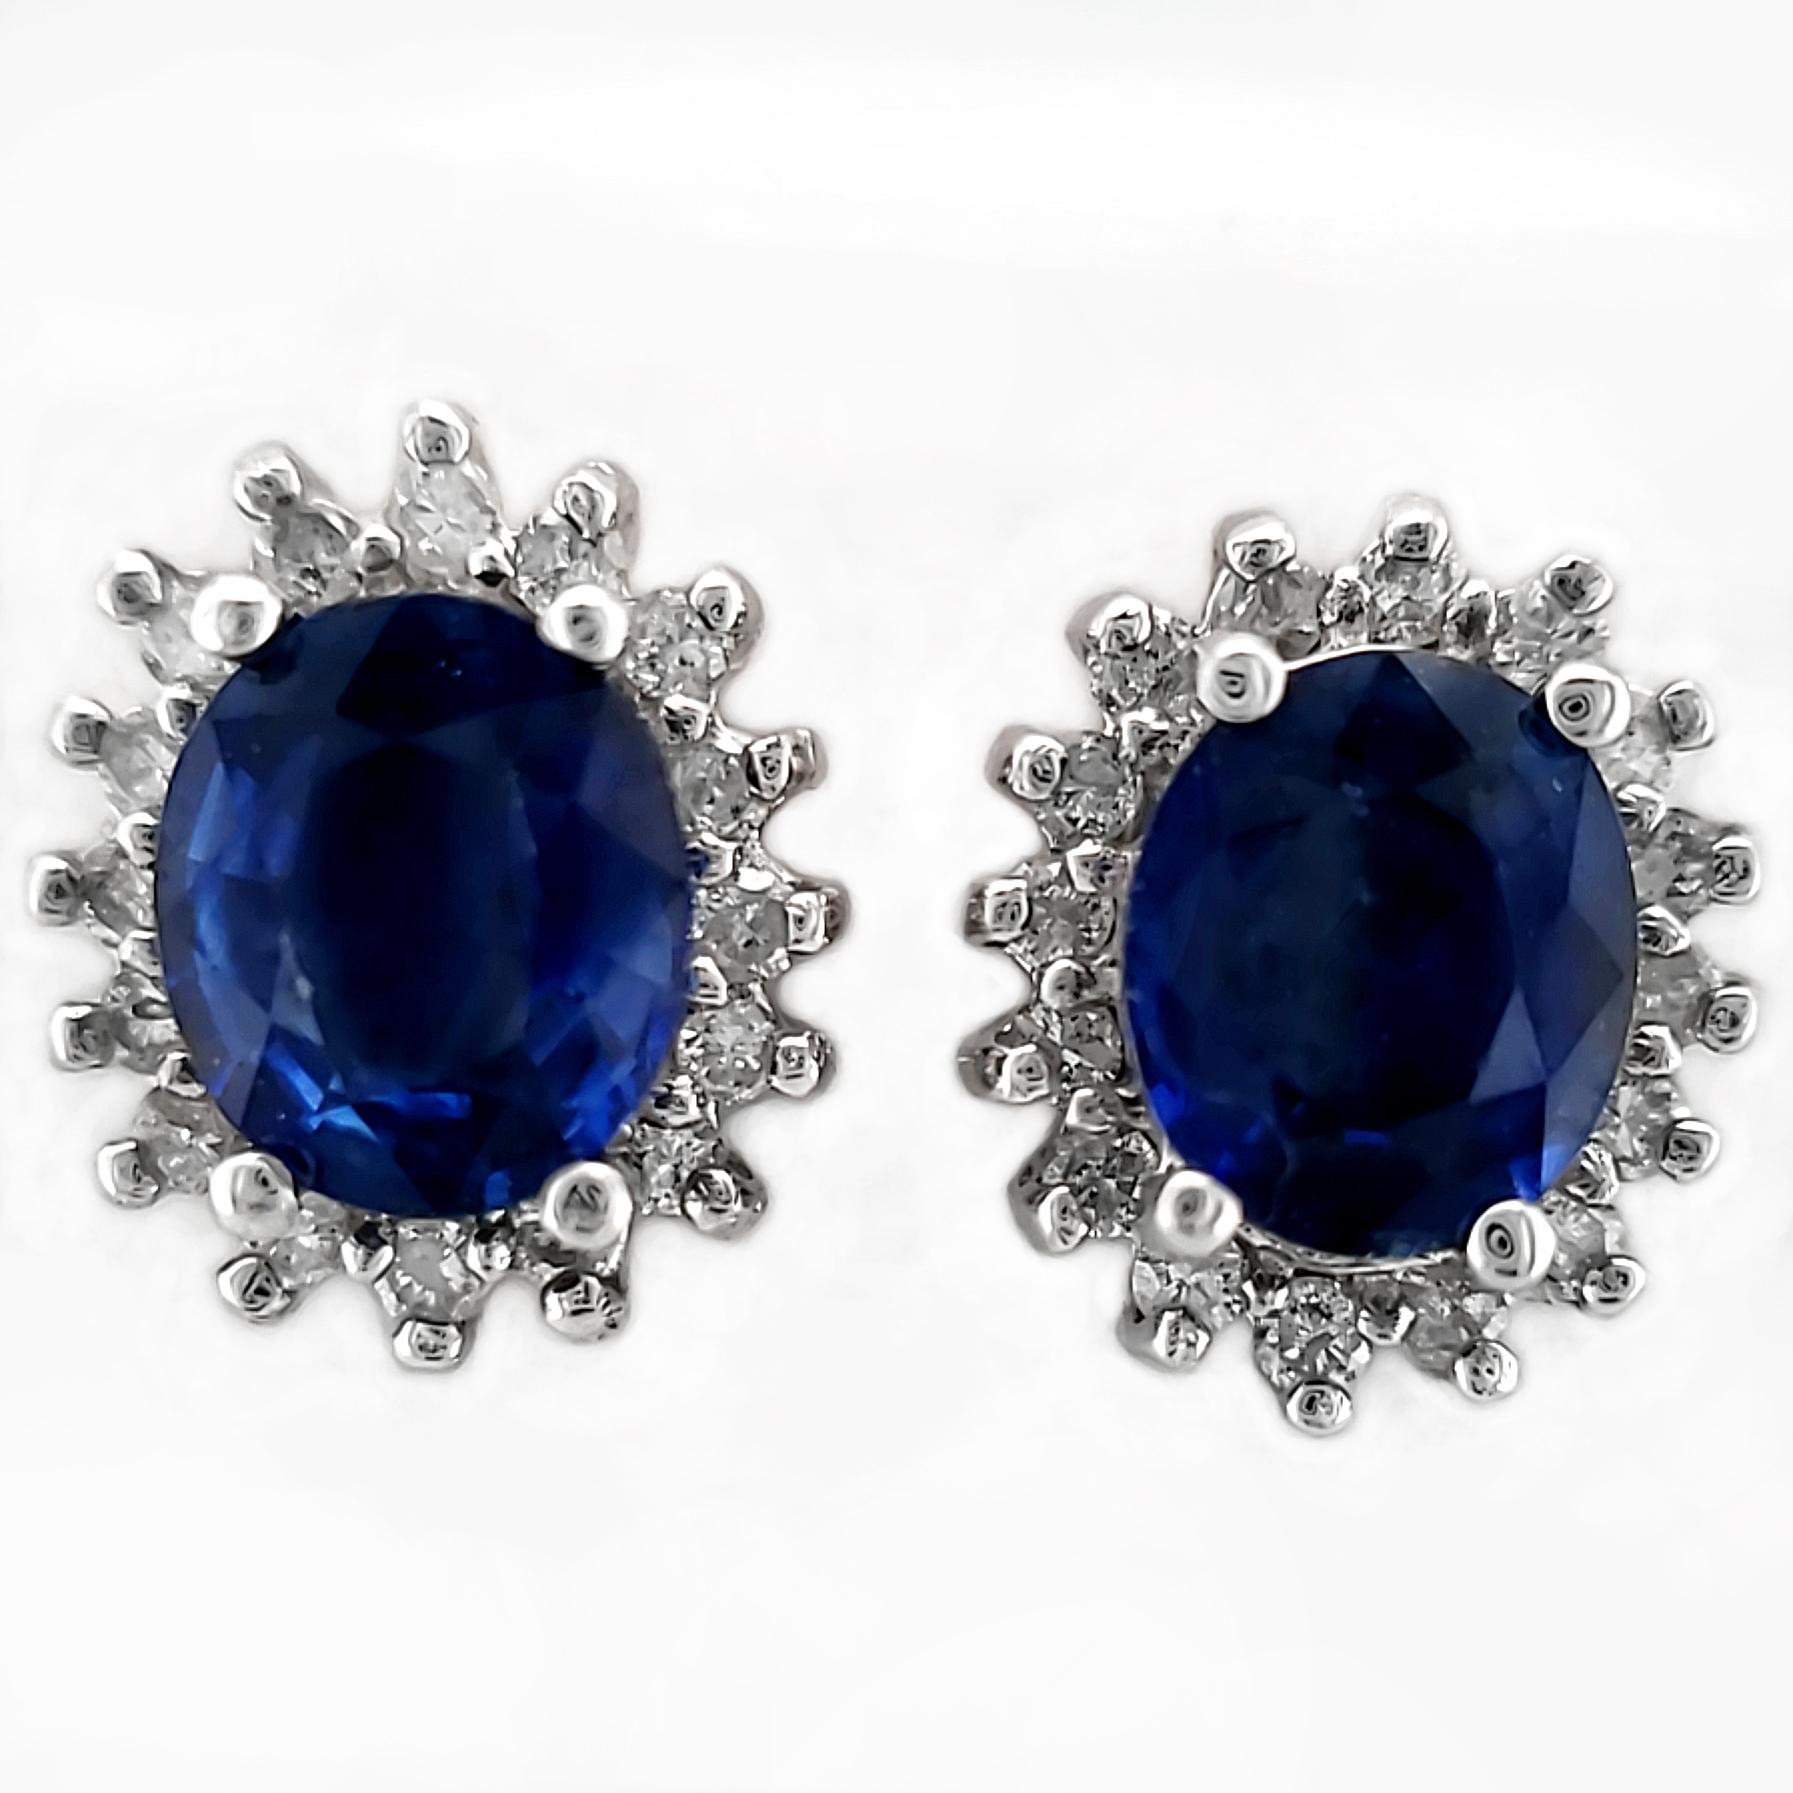 1.56 tcw. Blue Sapphire and Diamond Earrings